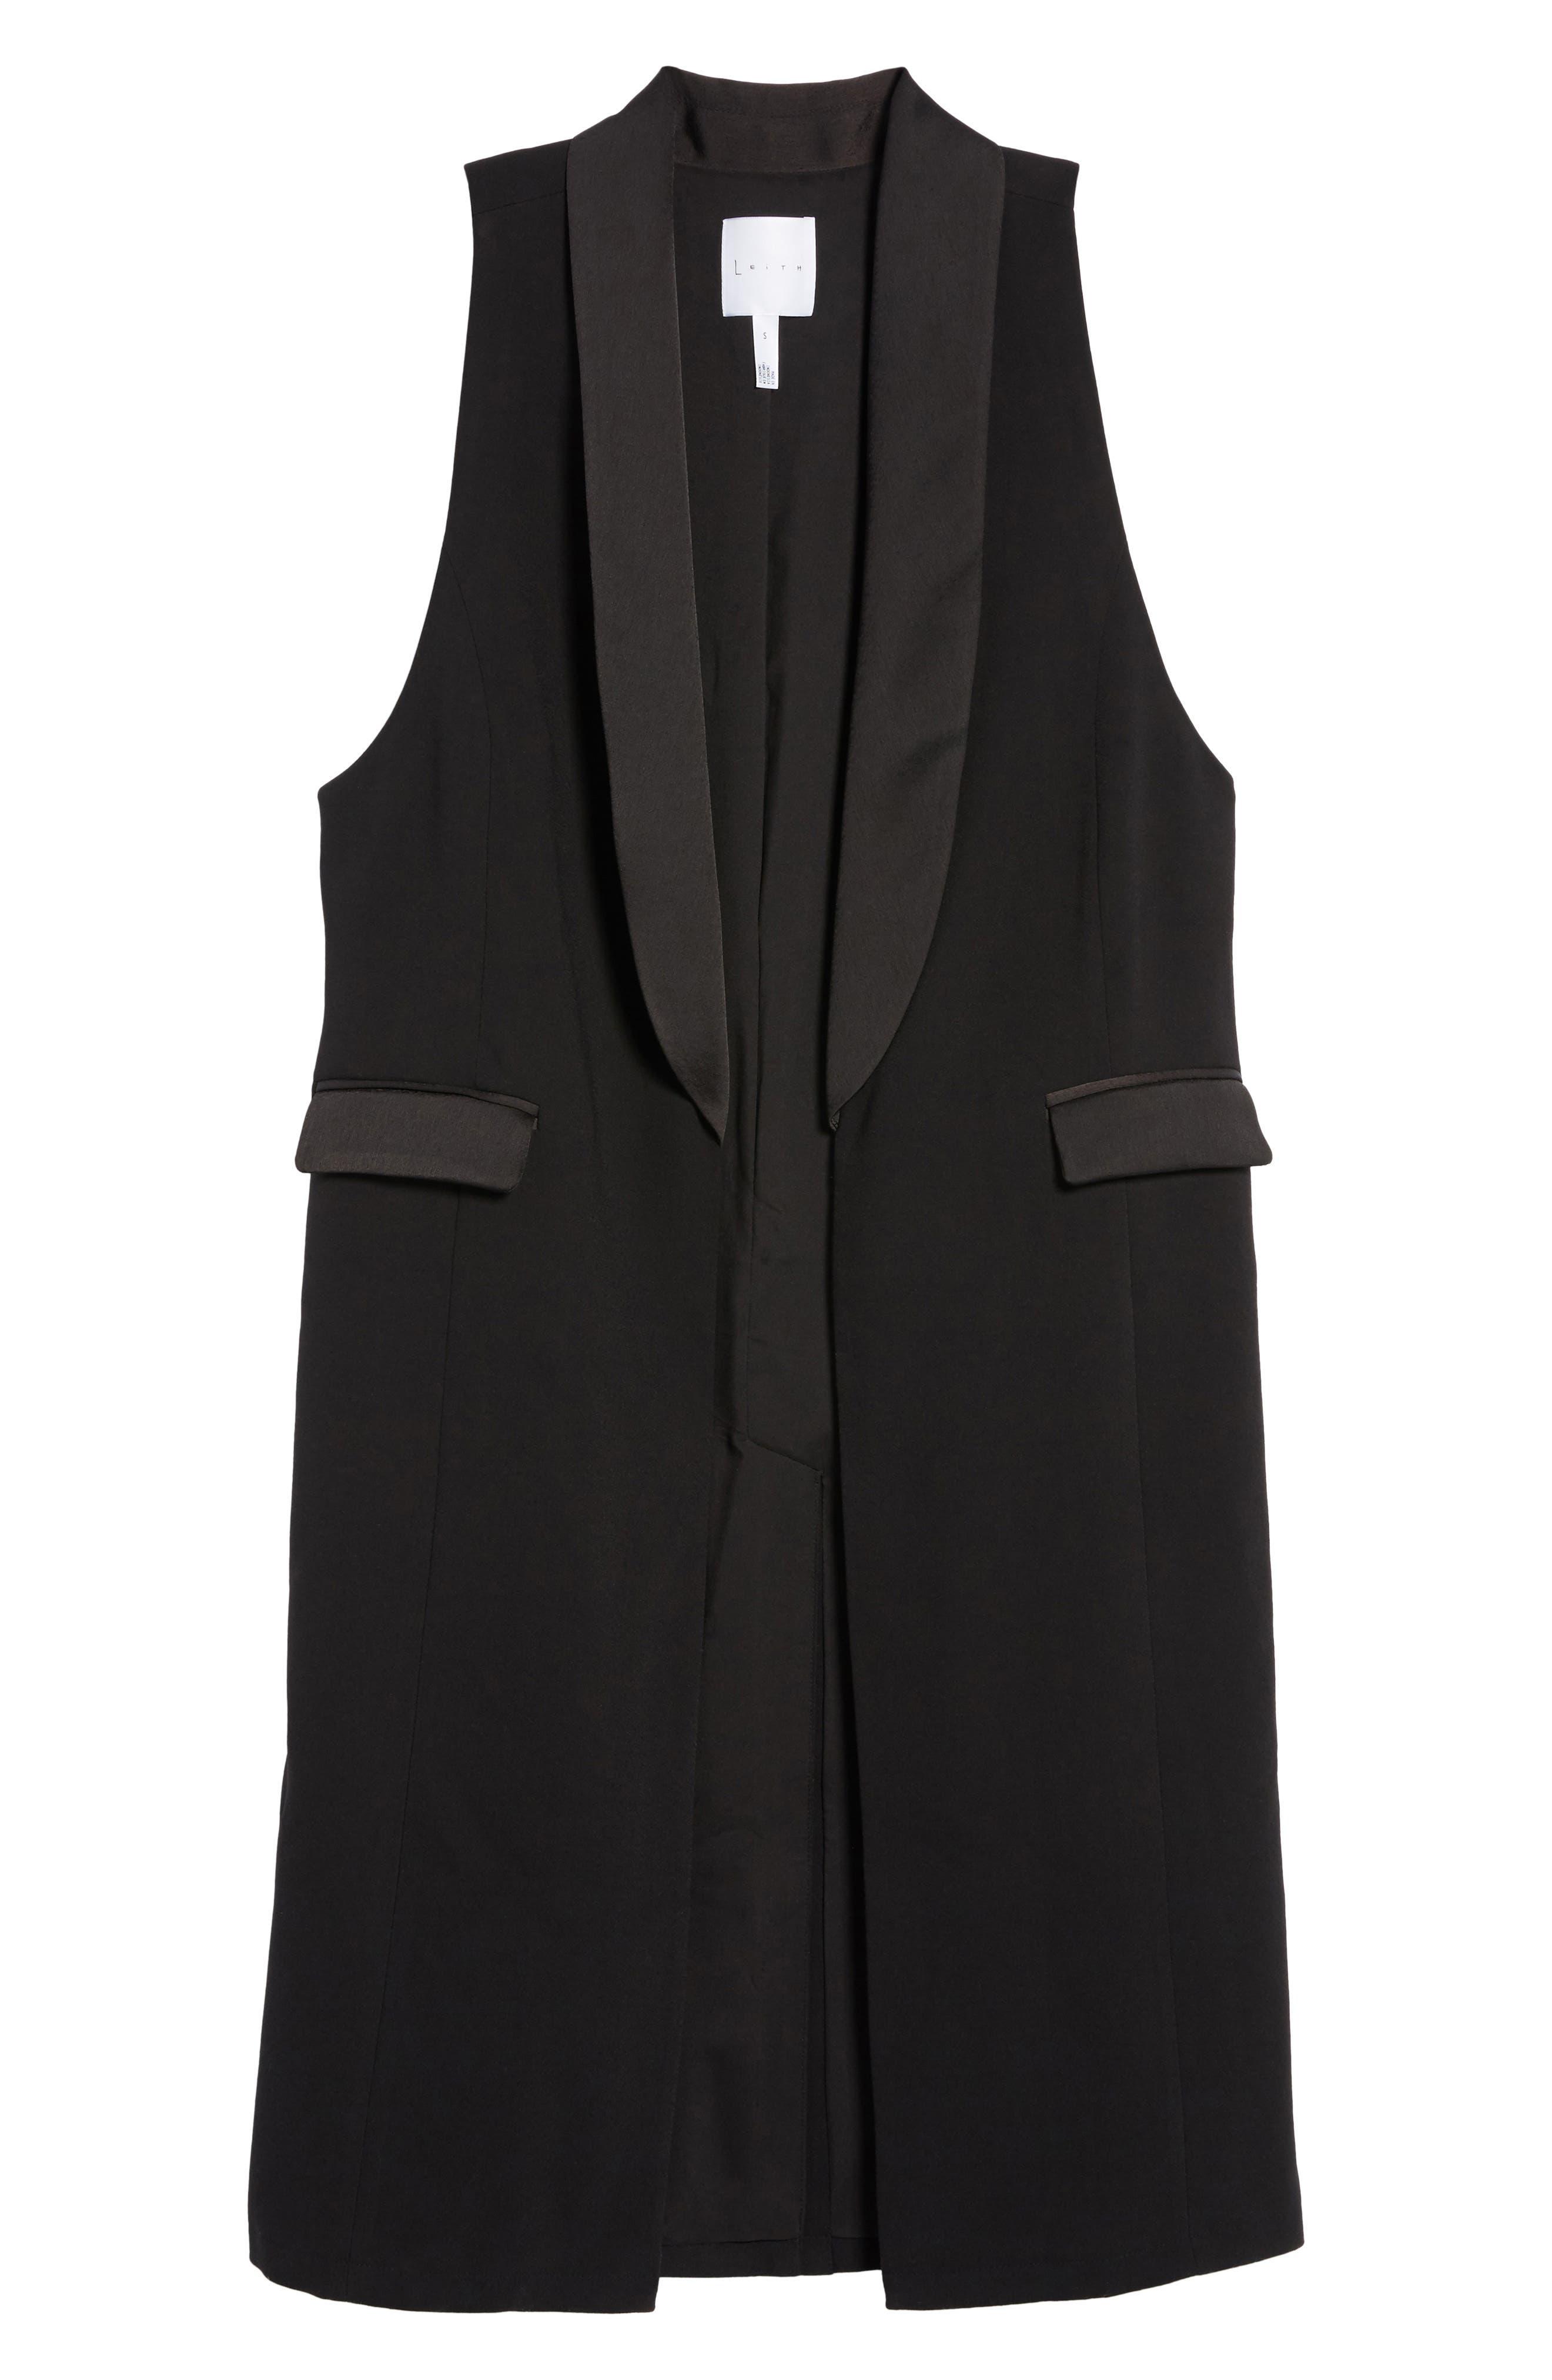 Tuxedo Vest,                             Alternate thumbnail 5, color,                             001